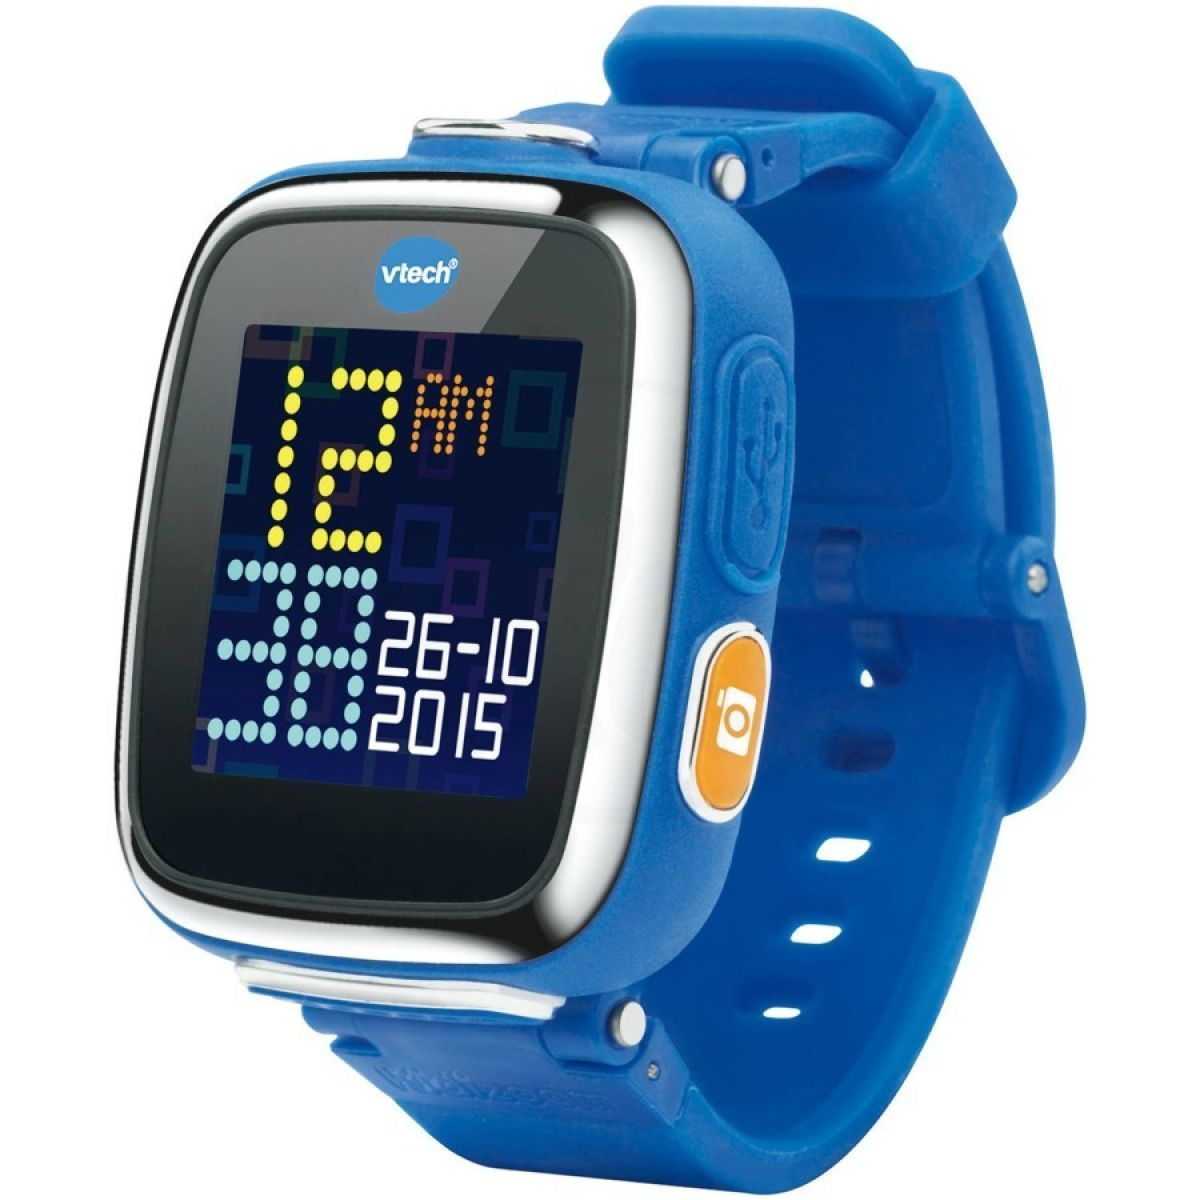 Vtech Kidizoom Smart Watch DX7 modré